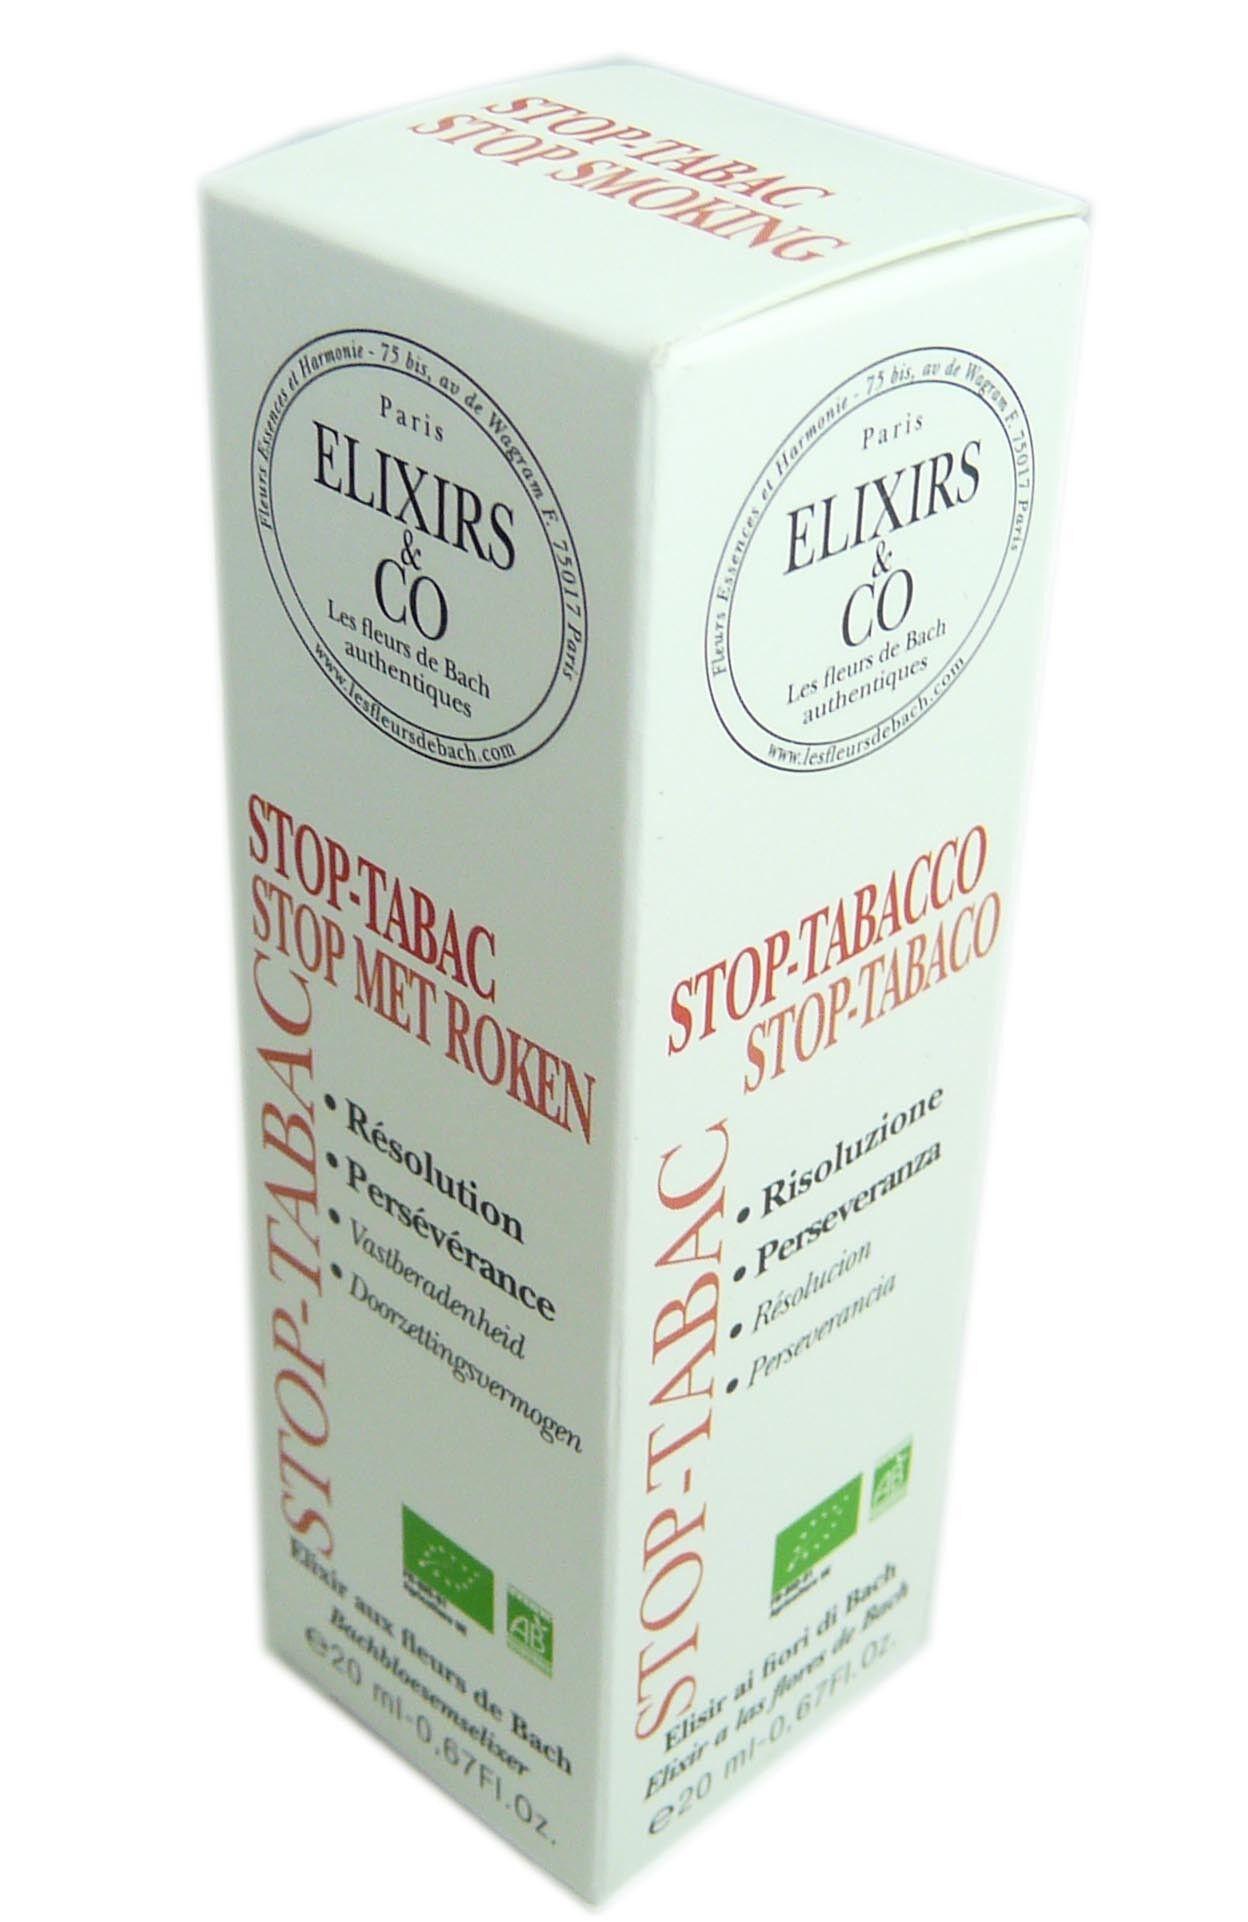 ELIXIRS & CO Elixir & co fleurs de bach stop-tabac 20ml